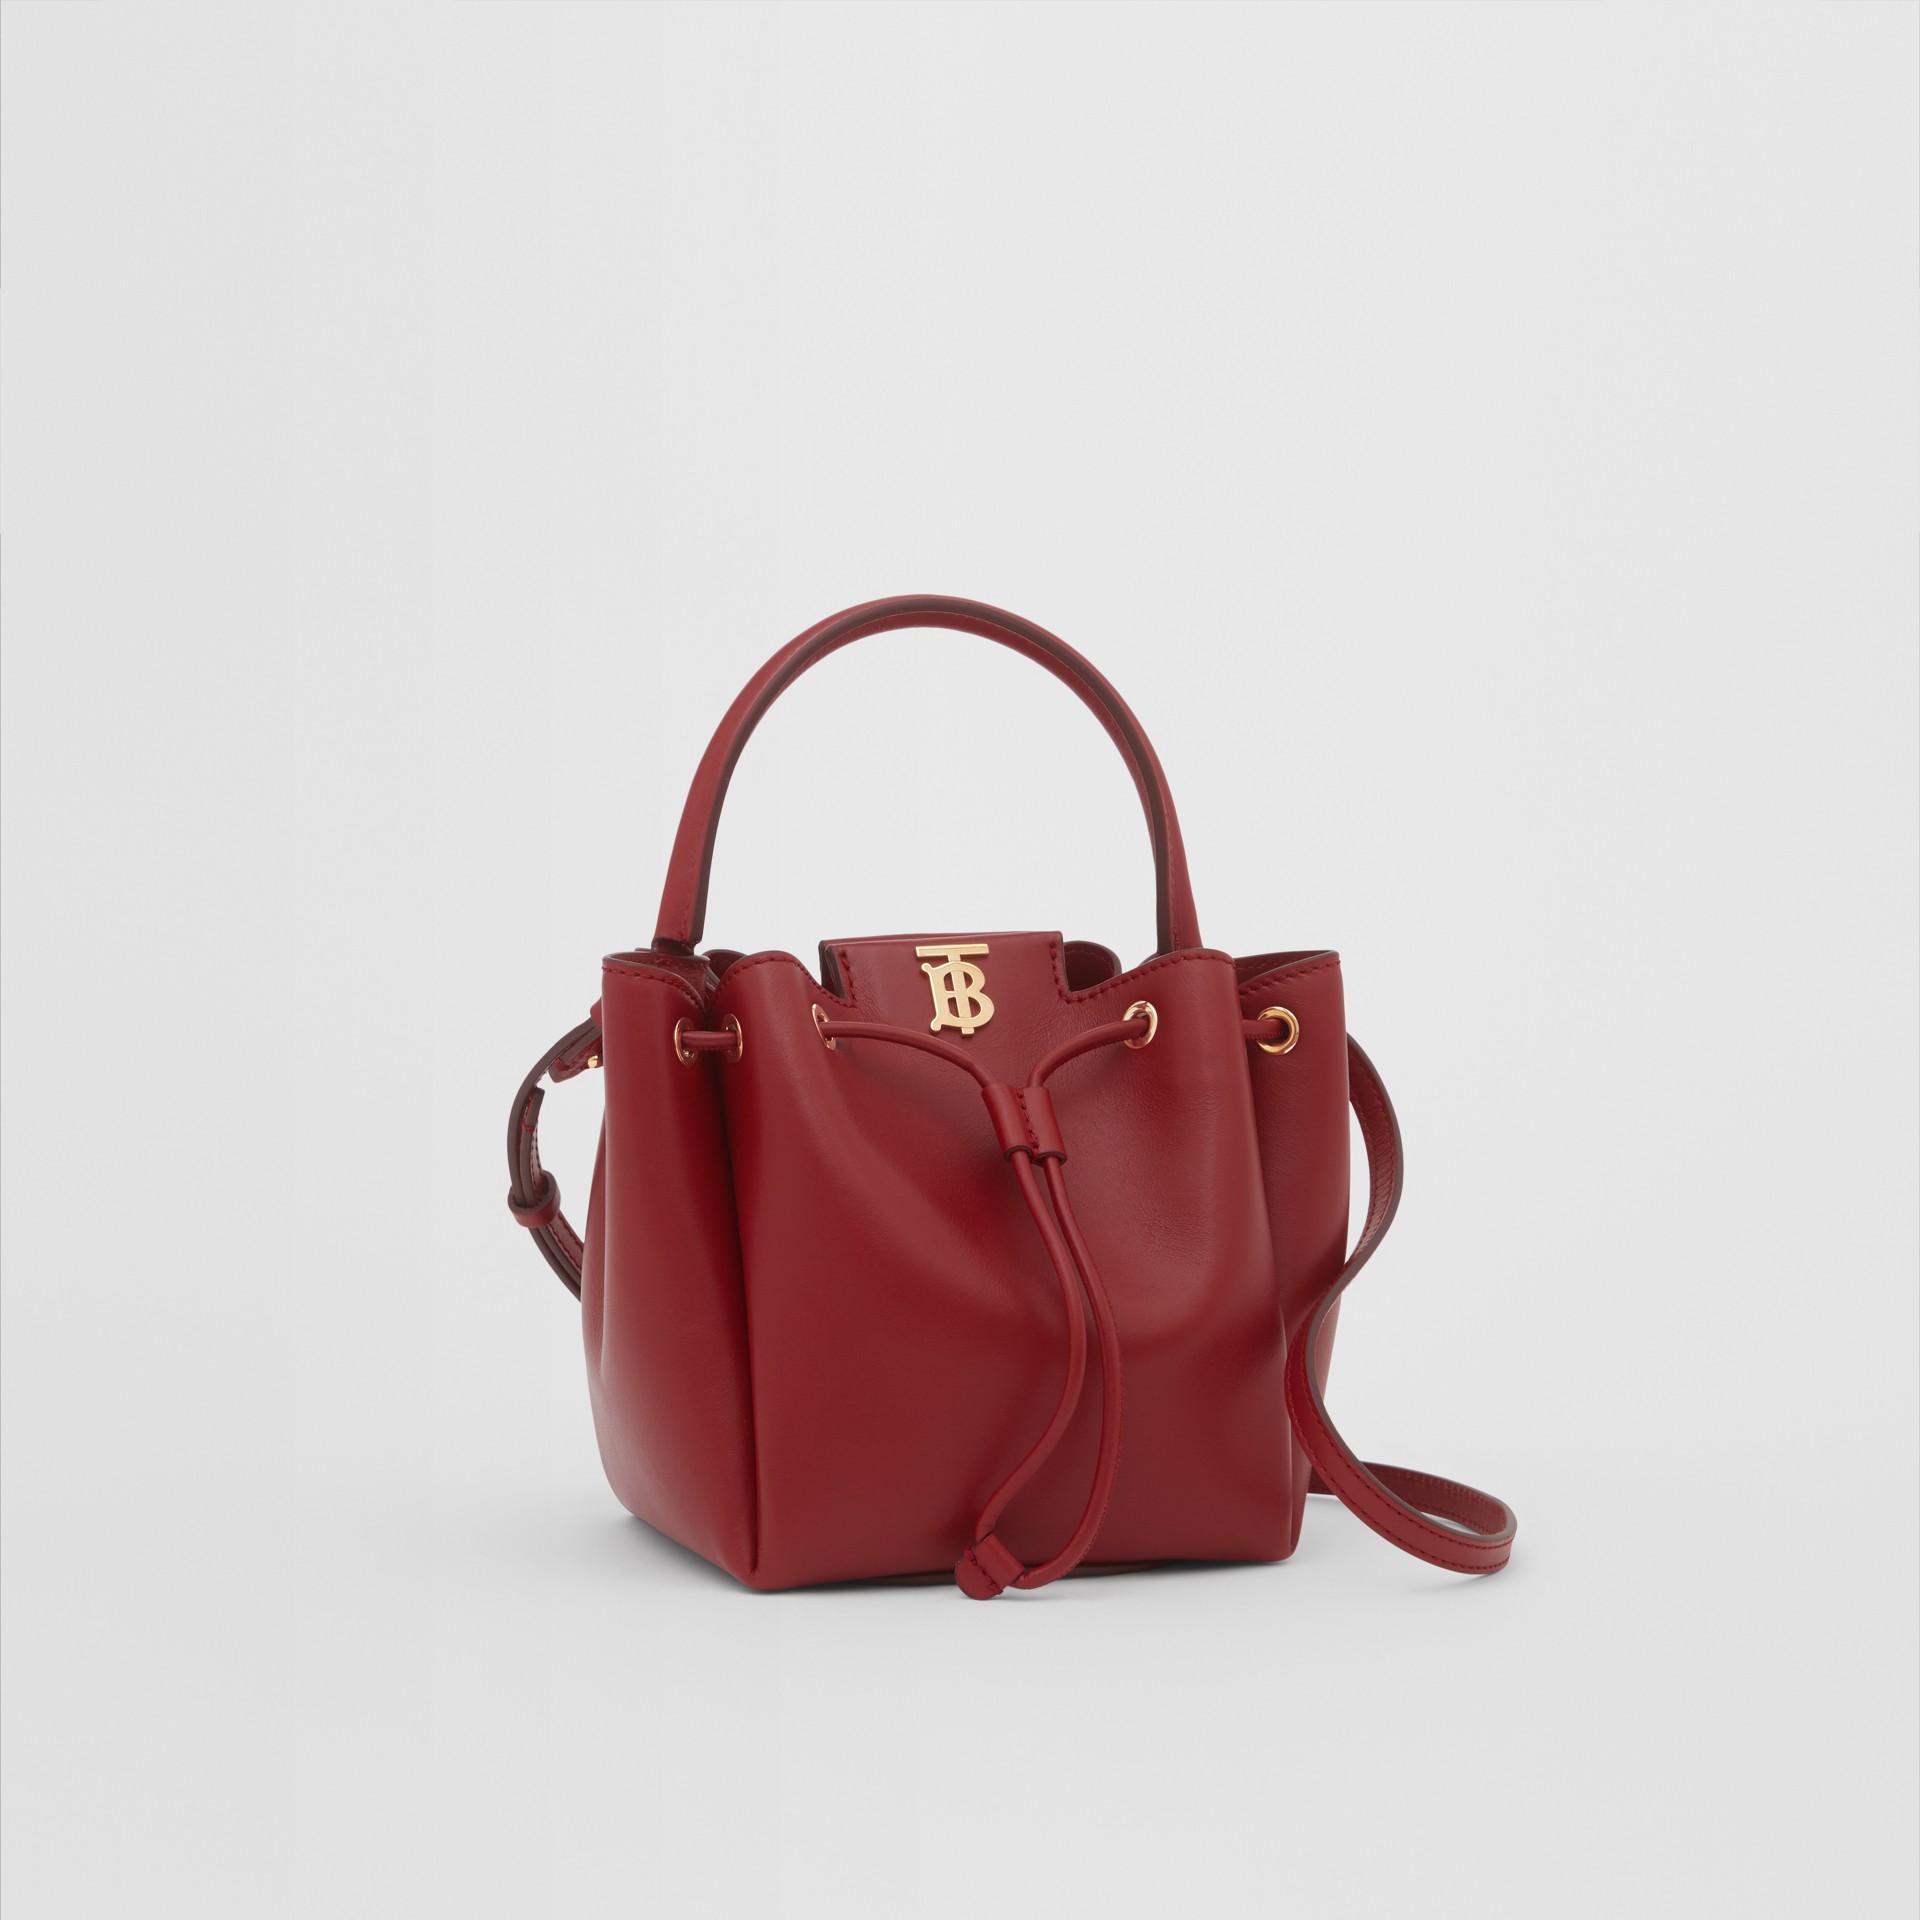 Monogram Motif Leather Bucket Bag in Dark Carmine - Women | Burberry United States - gallery image 4